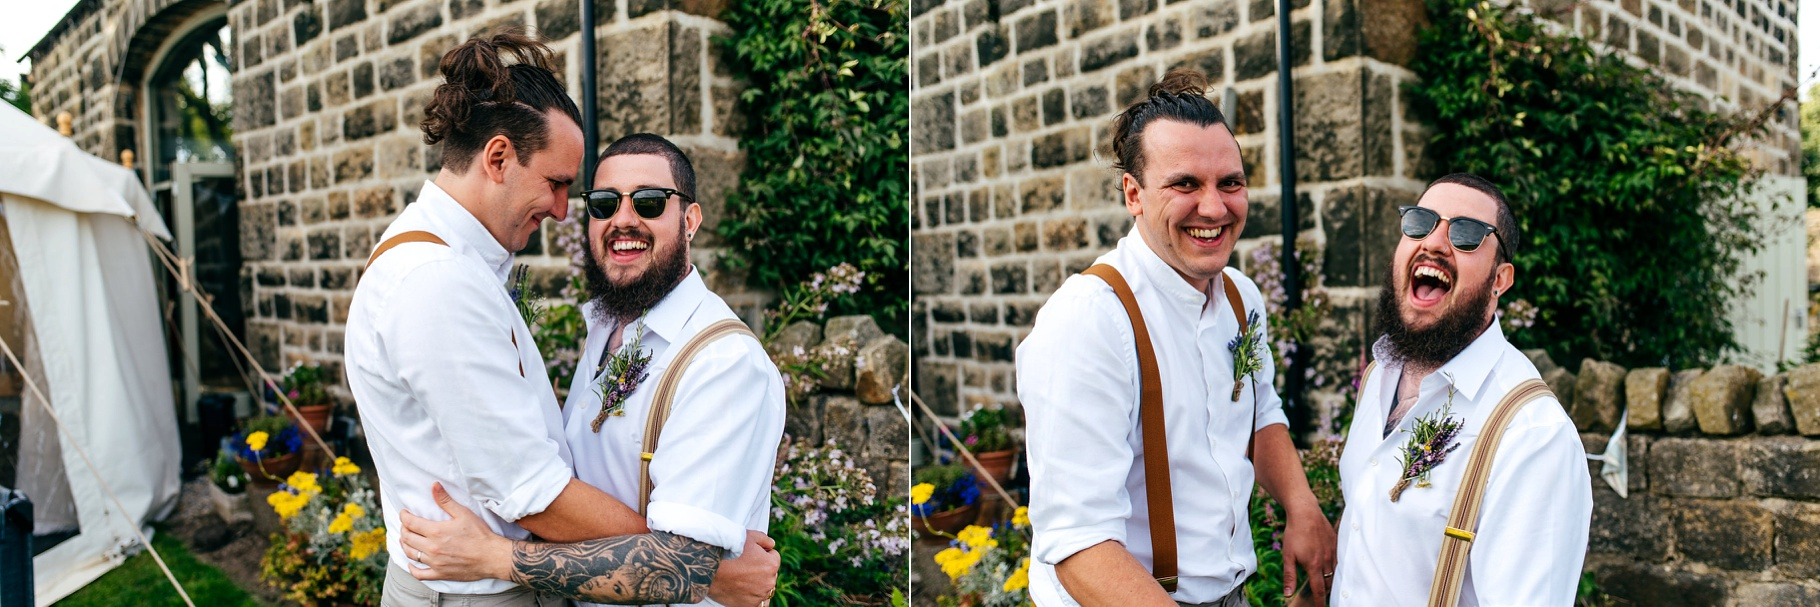 best-fun-wedding-photography083